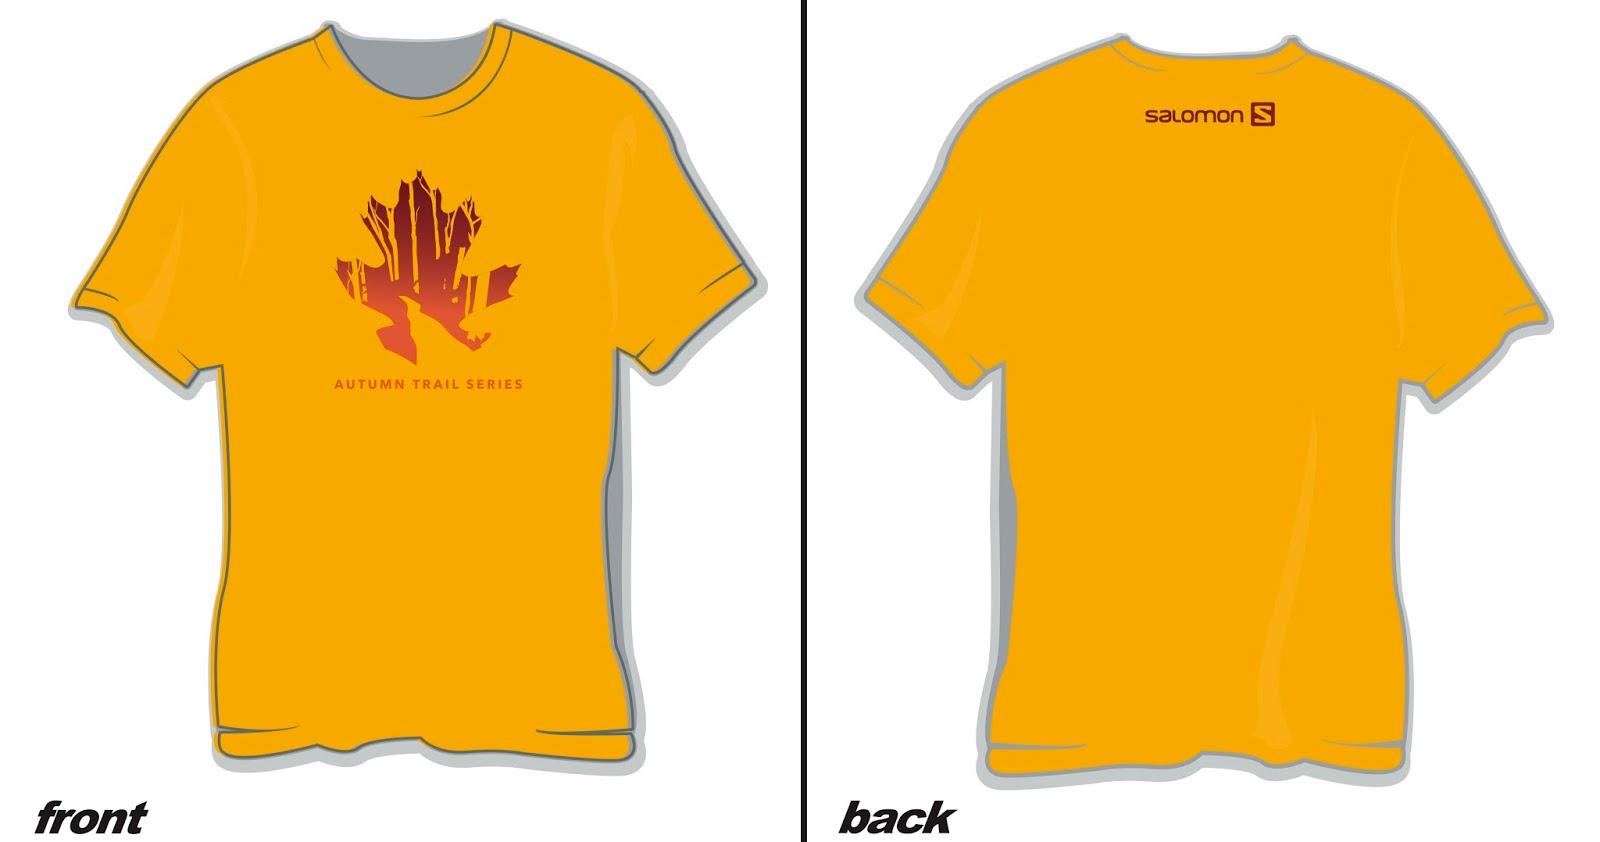 Autumn Trail Series Race Shirt Design 2017